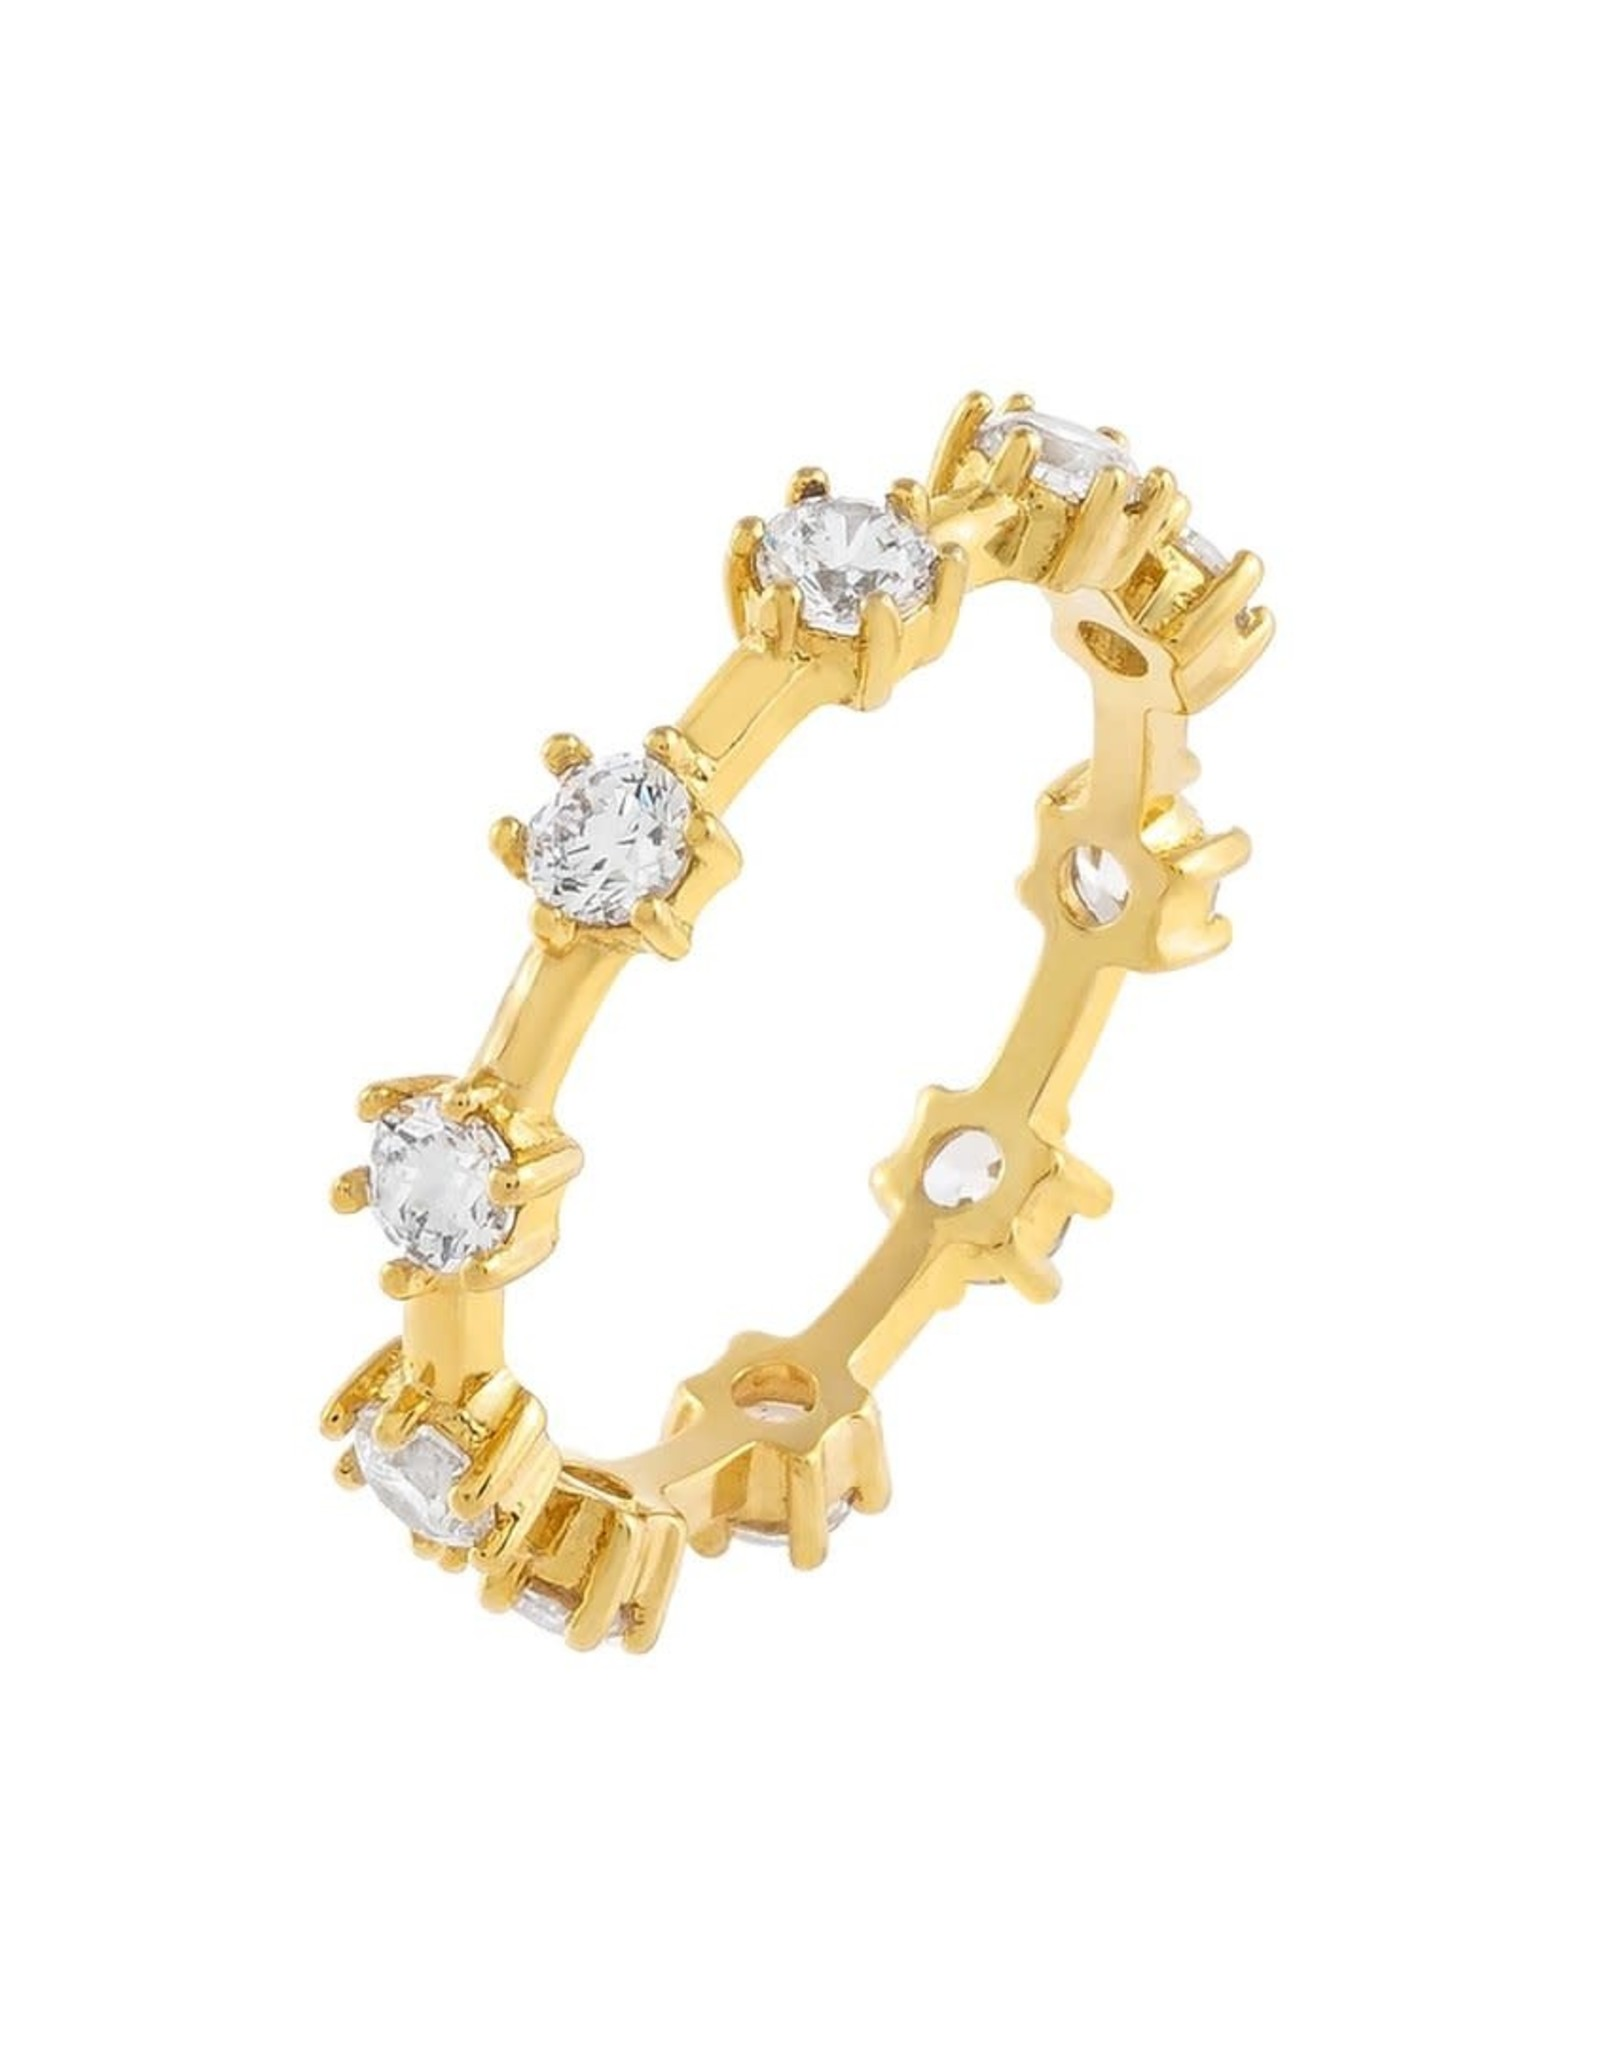 Adinas CZ Colored Multi Stone Ring